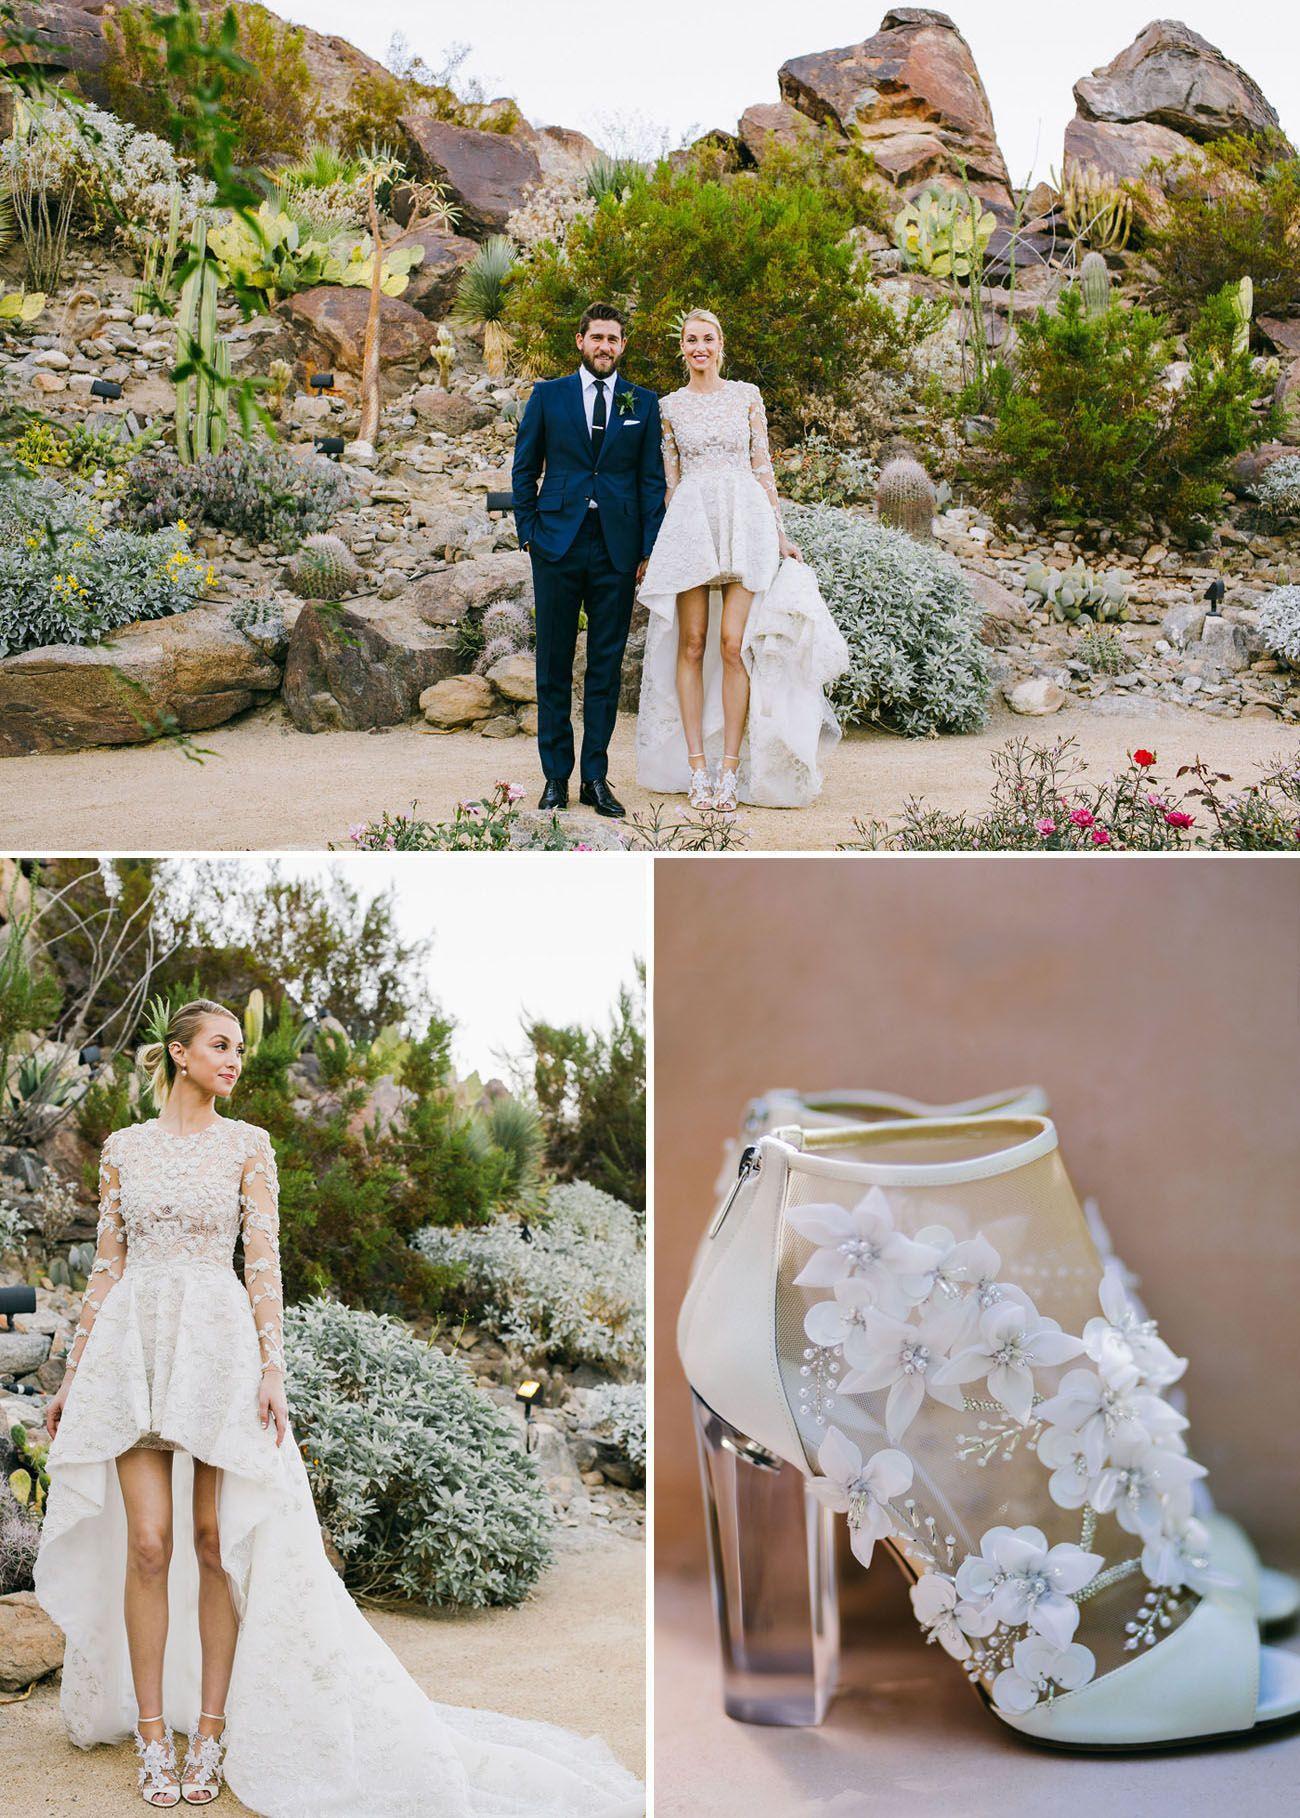 Top 10 Most Popular Weddings From 2016 Green Wedding Shoes Popular Wedding Whitney Port Wedding Celebrity Wedding Photos